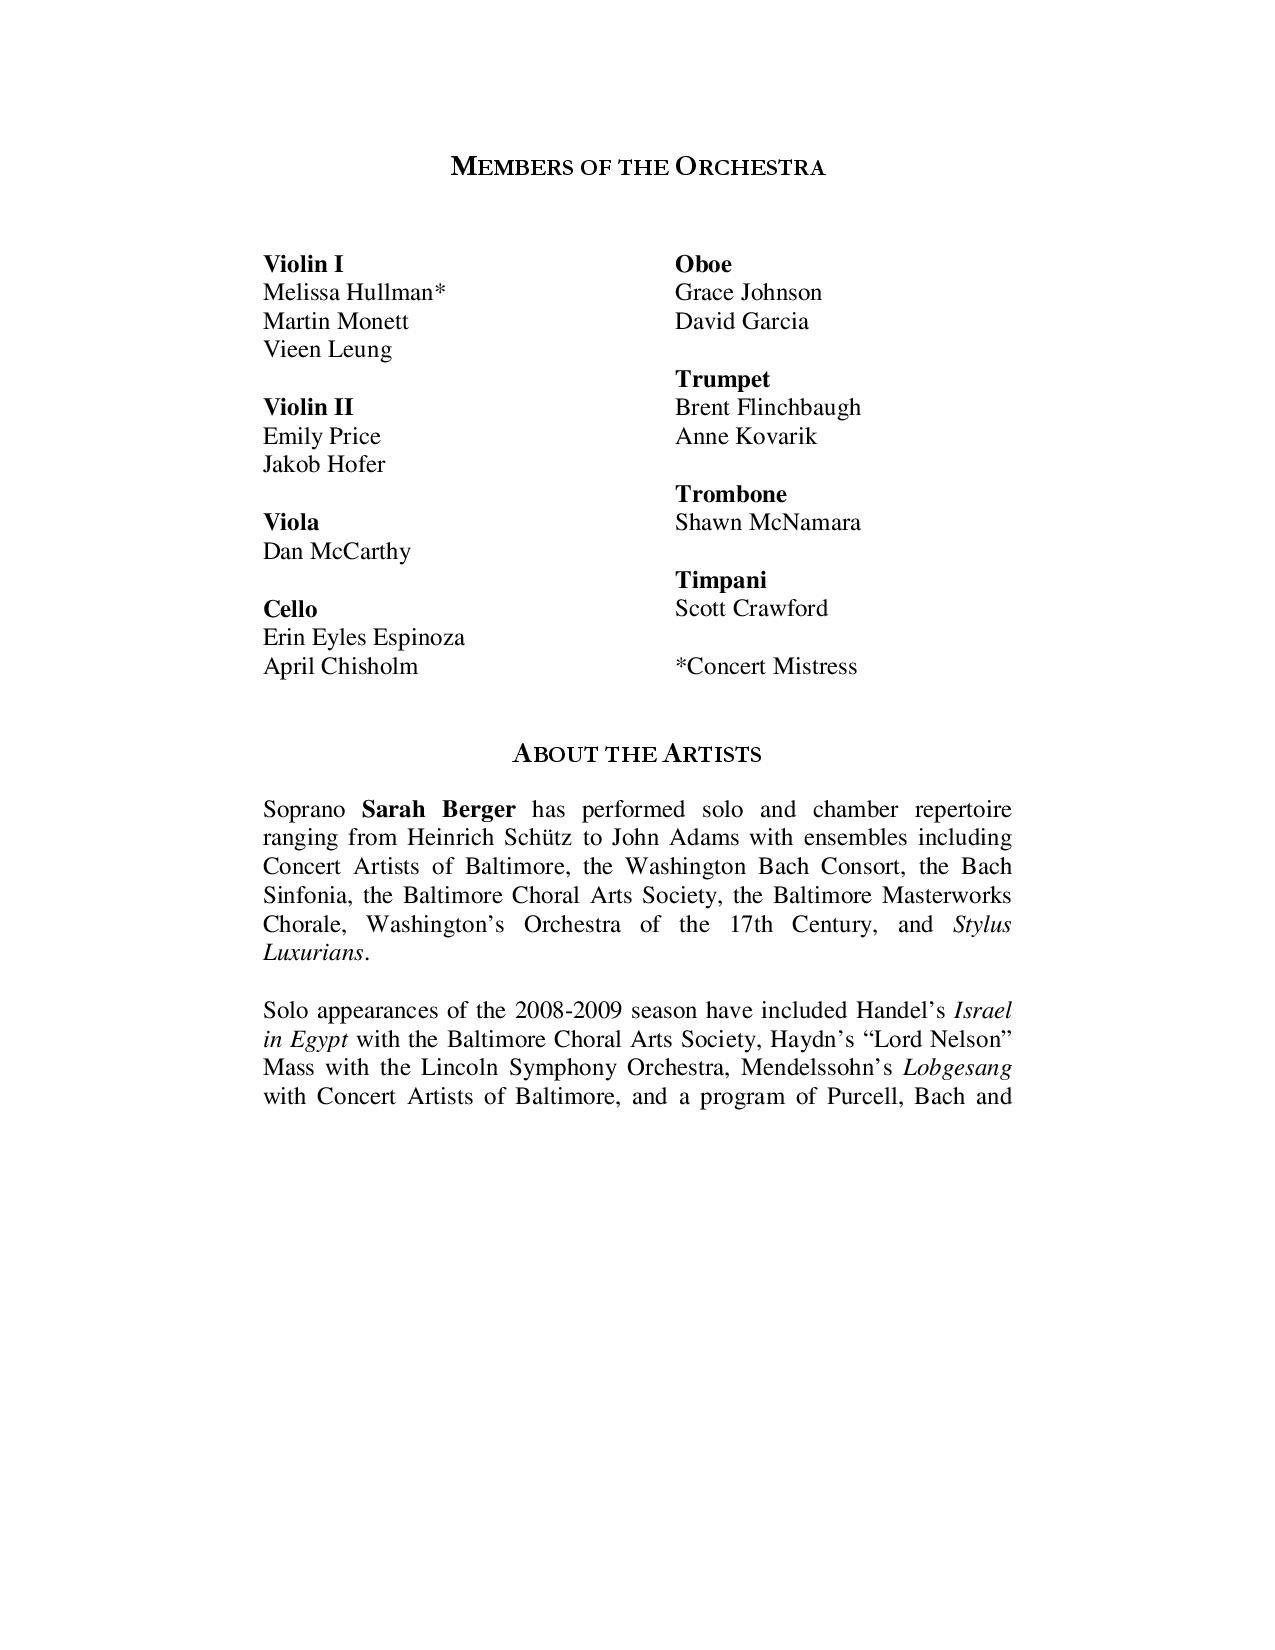 2009-04-26 - Program for Printing-page-005.jpg